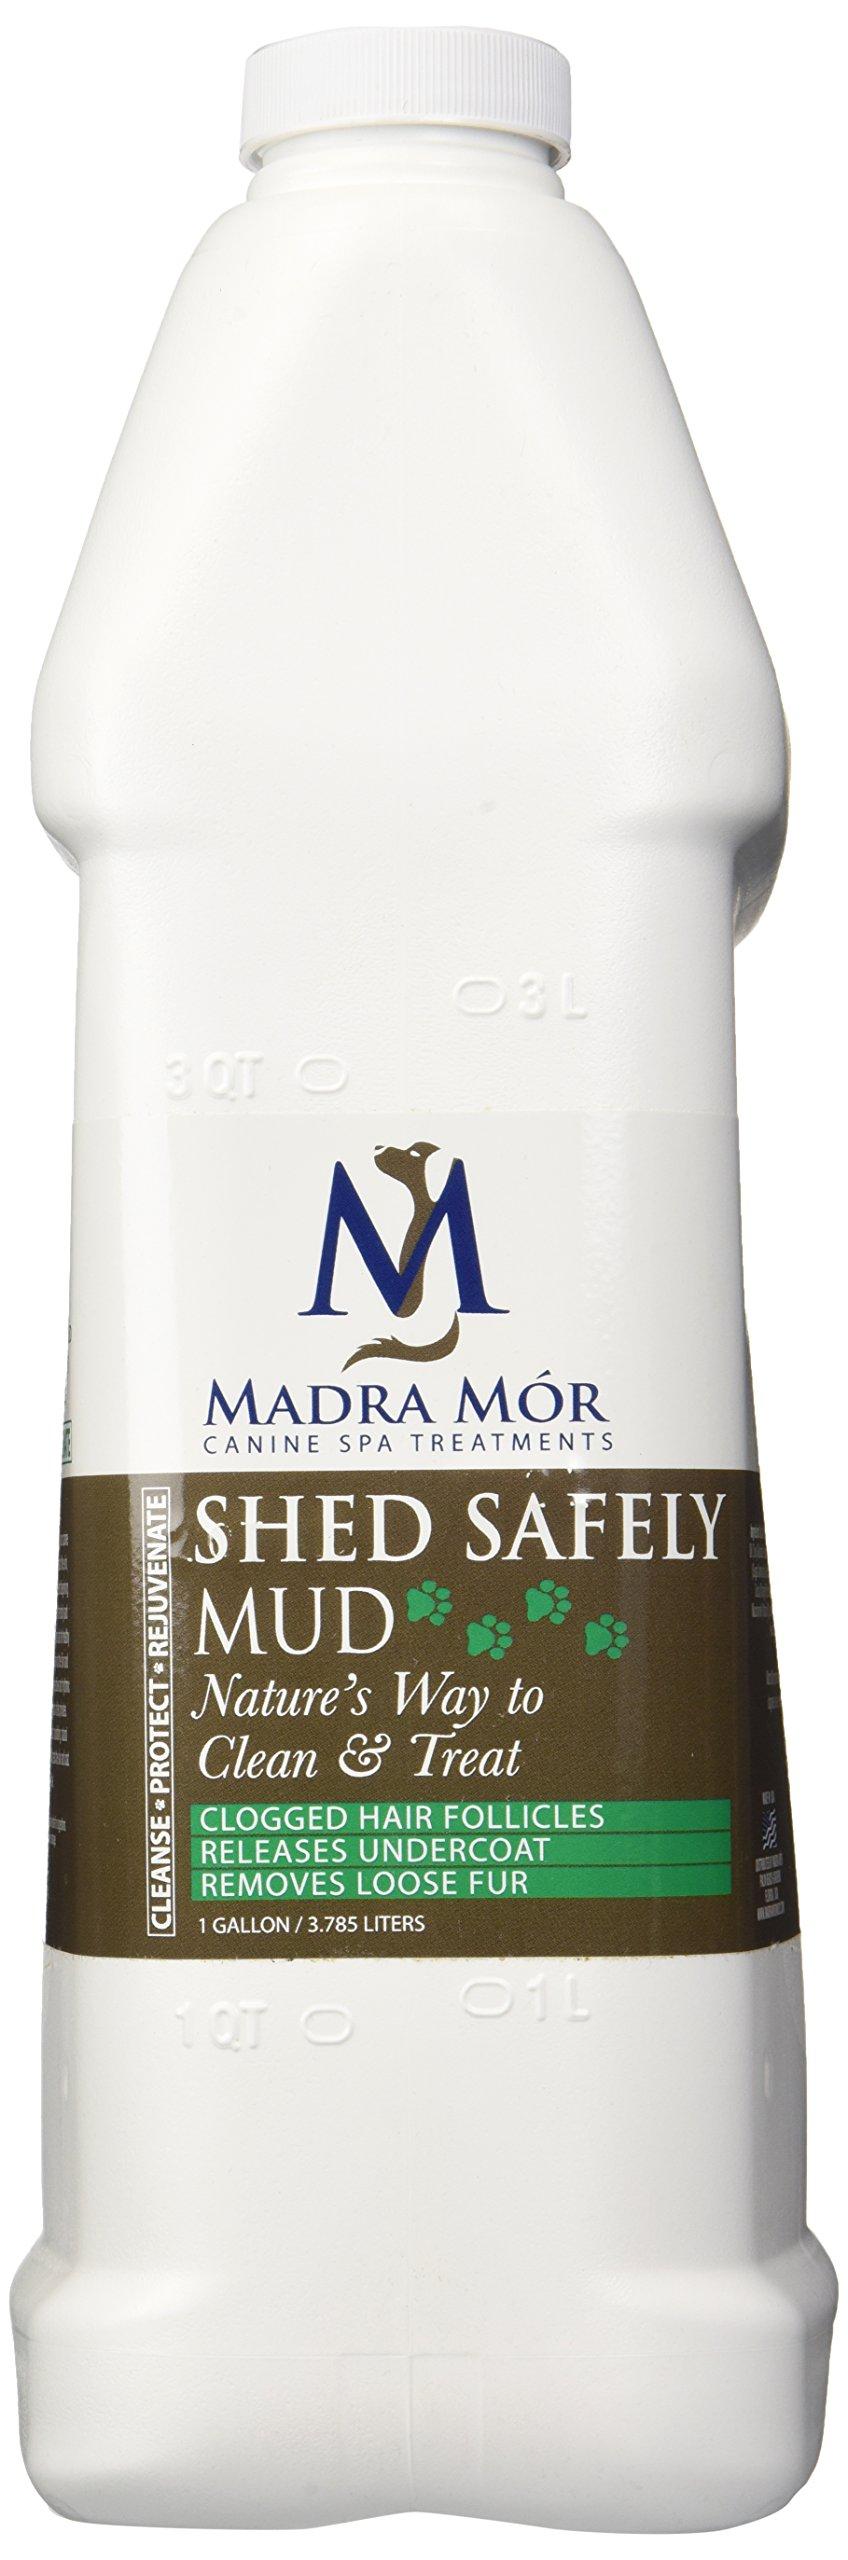 Madra Mór Canine Spa Treatment, Shed Safely Mud